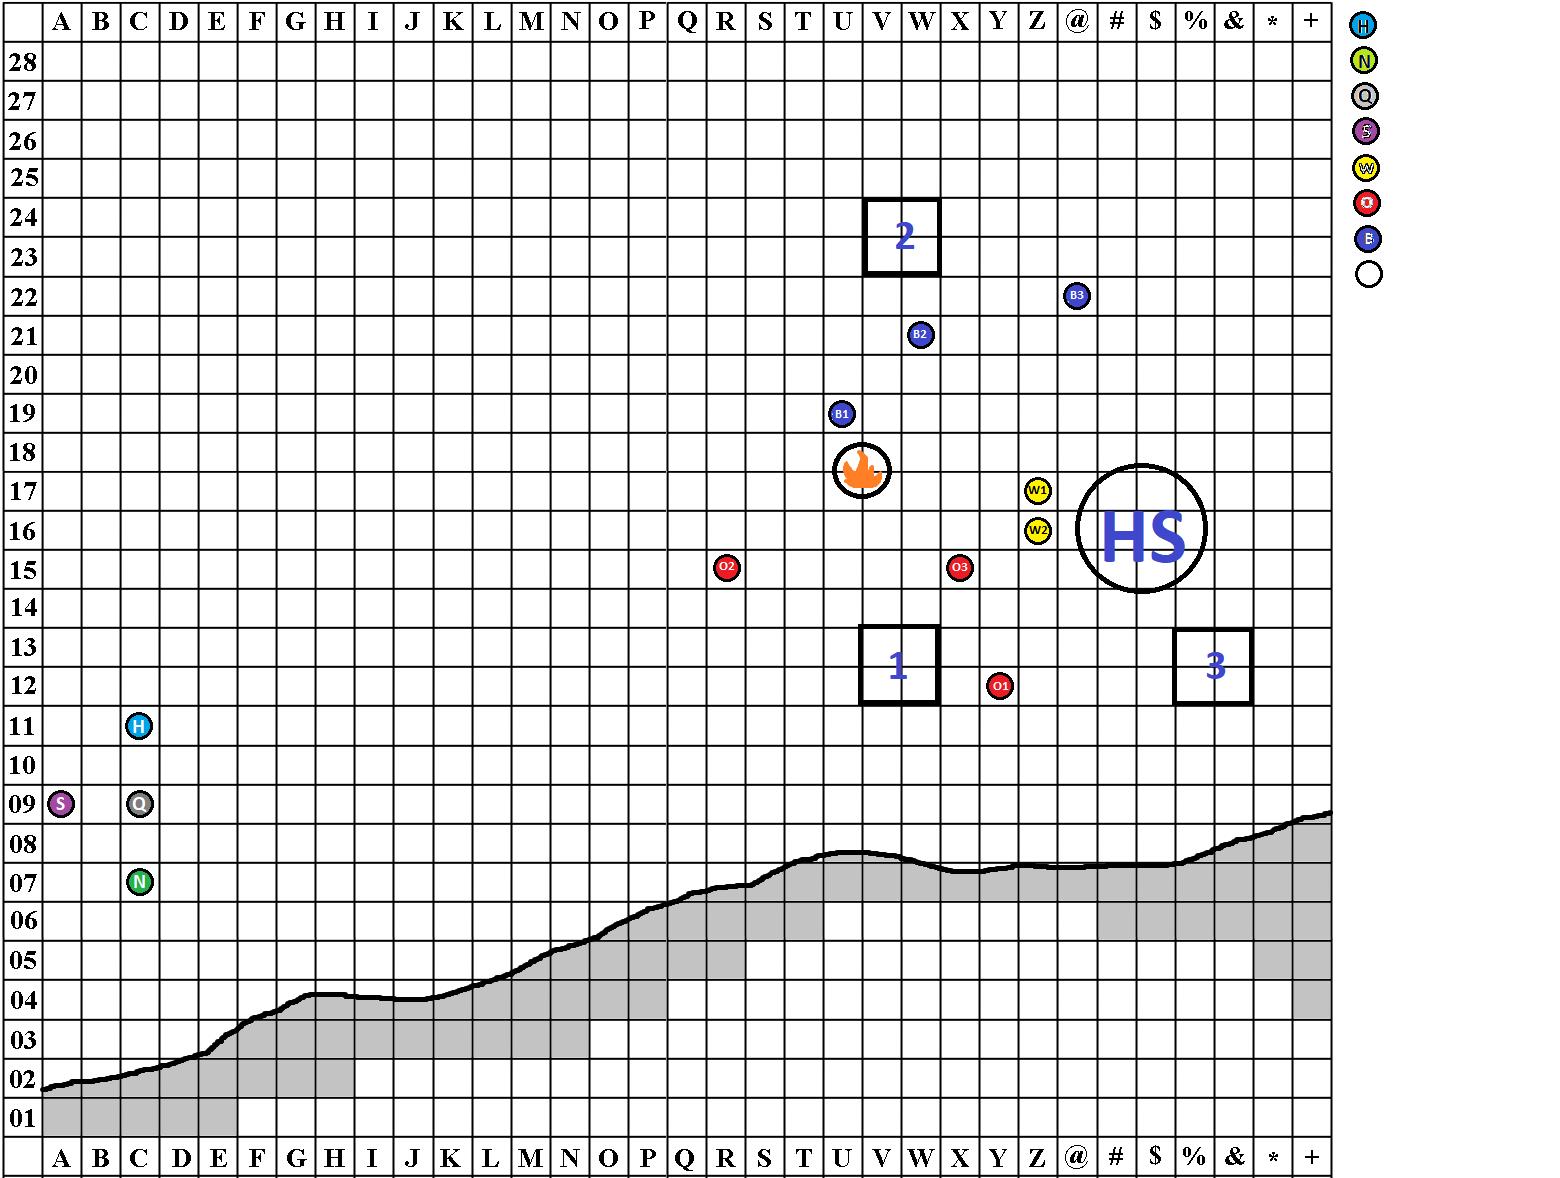 Ravine-Clifftop-Battle-001.png